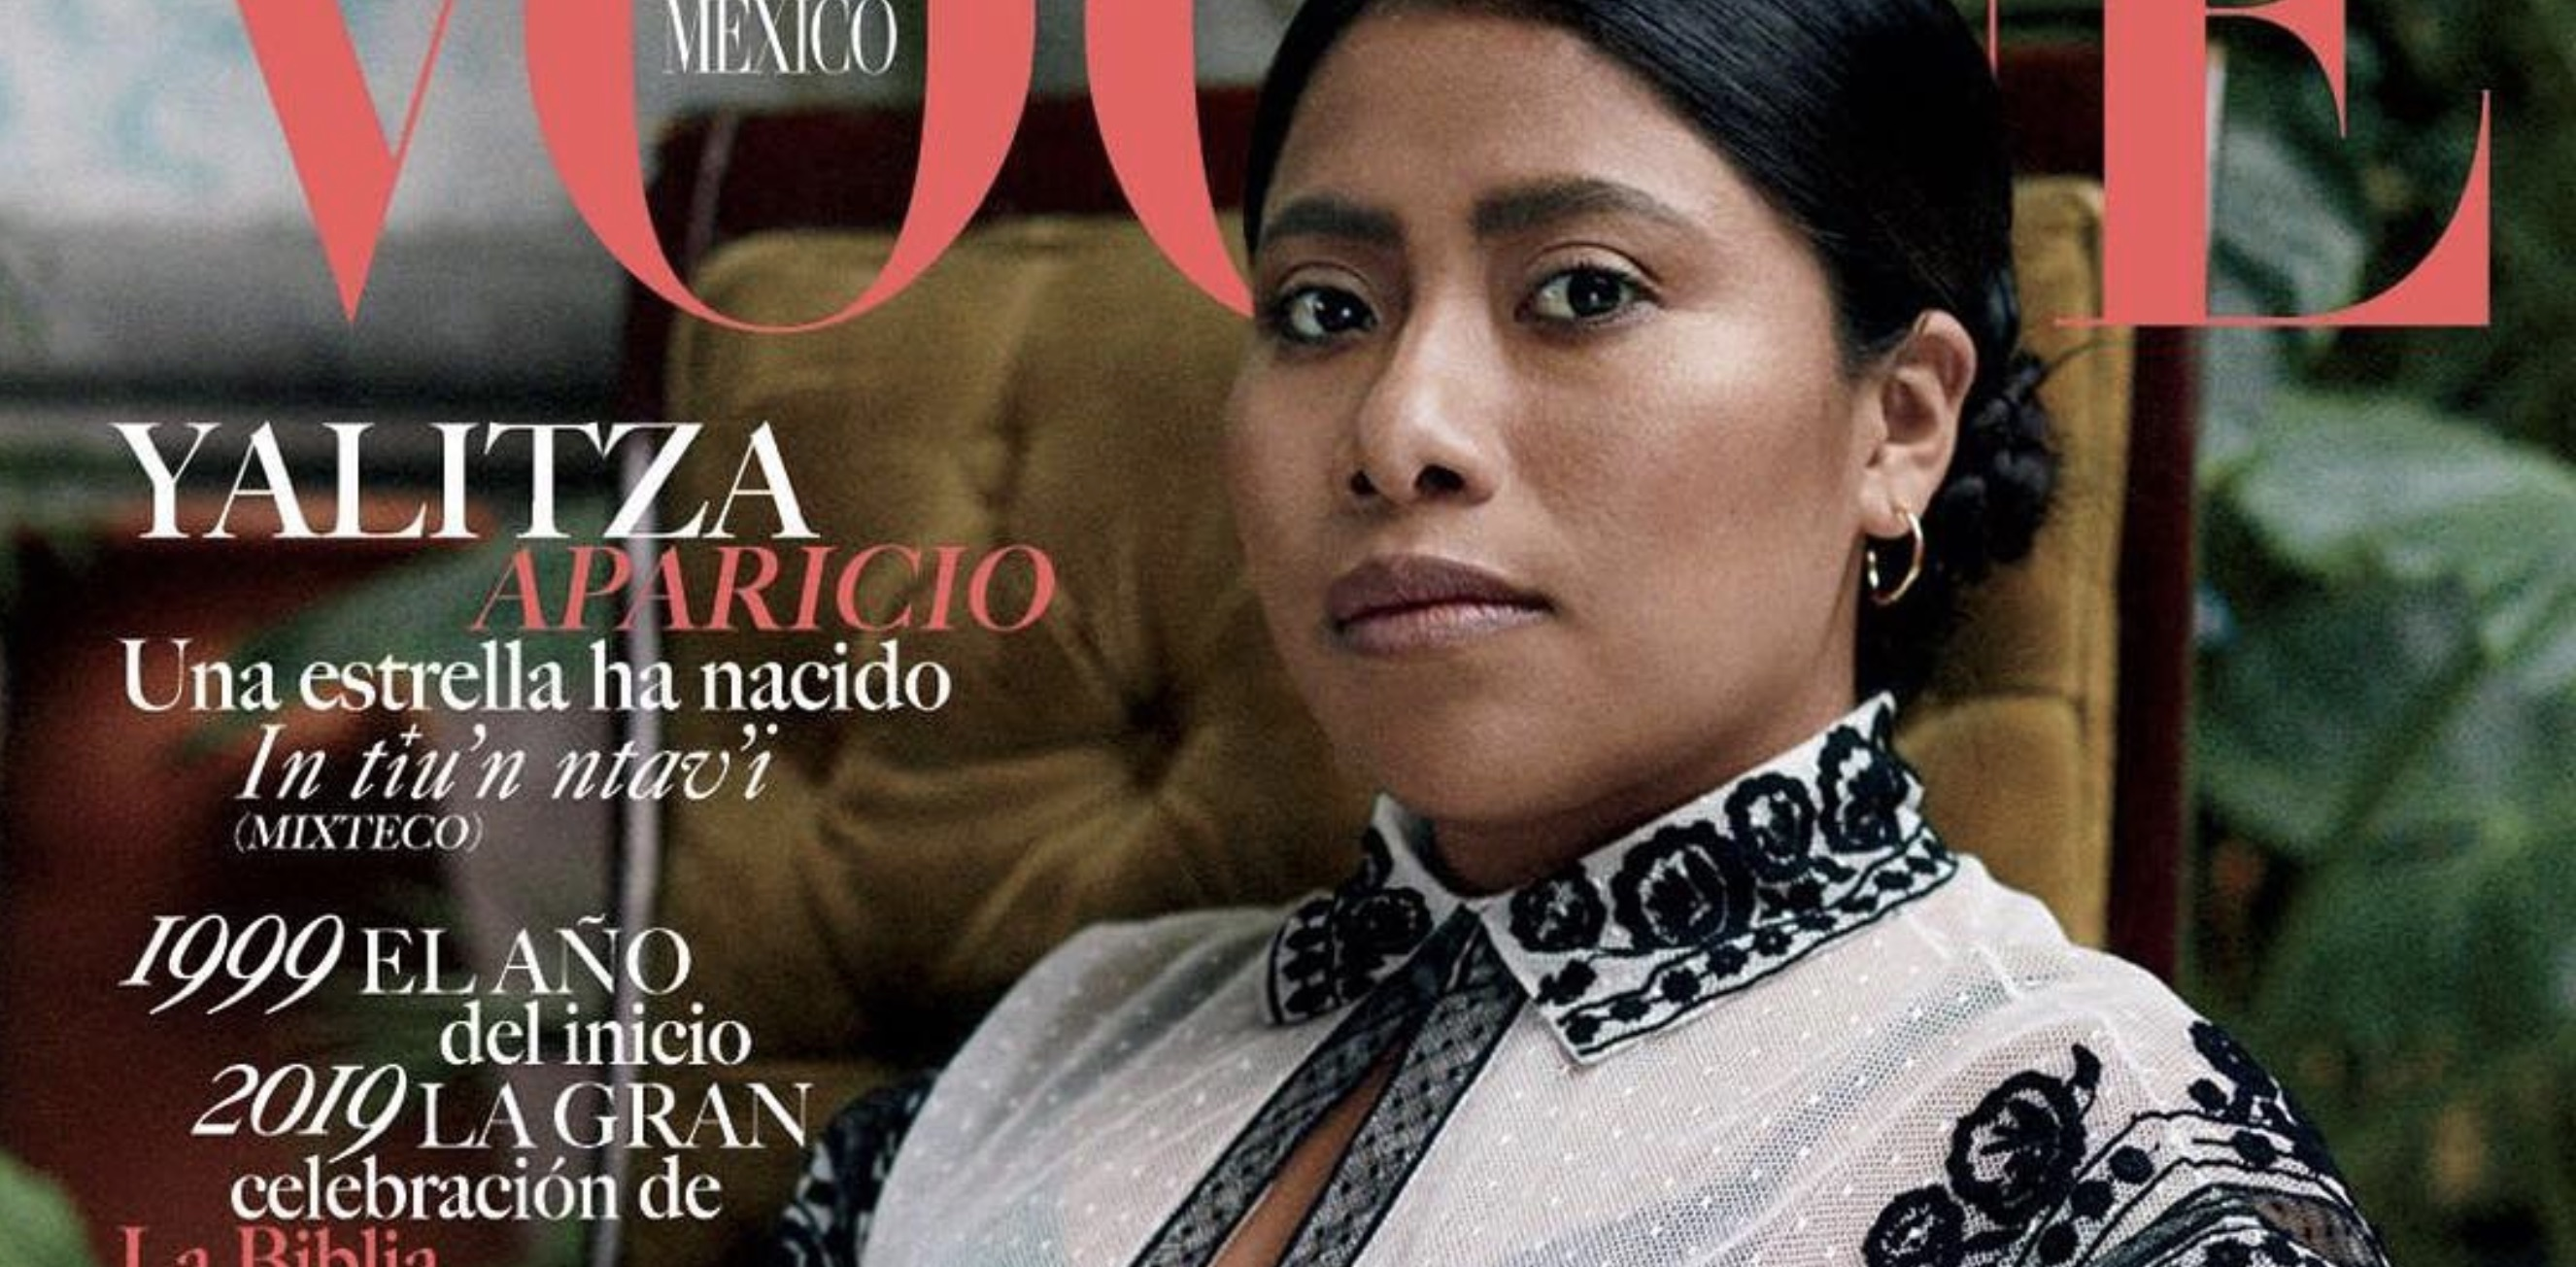 Roma Film: Yalitza Aparicio, The Indigenous Star Of 'Roma,' Lands